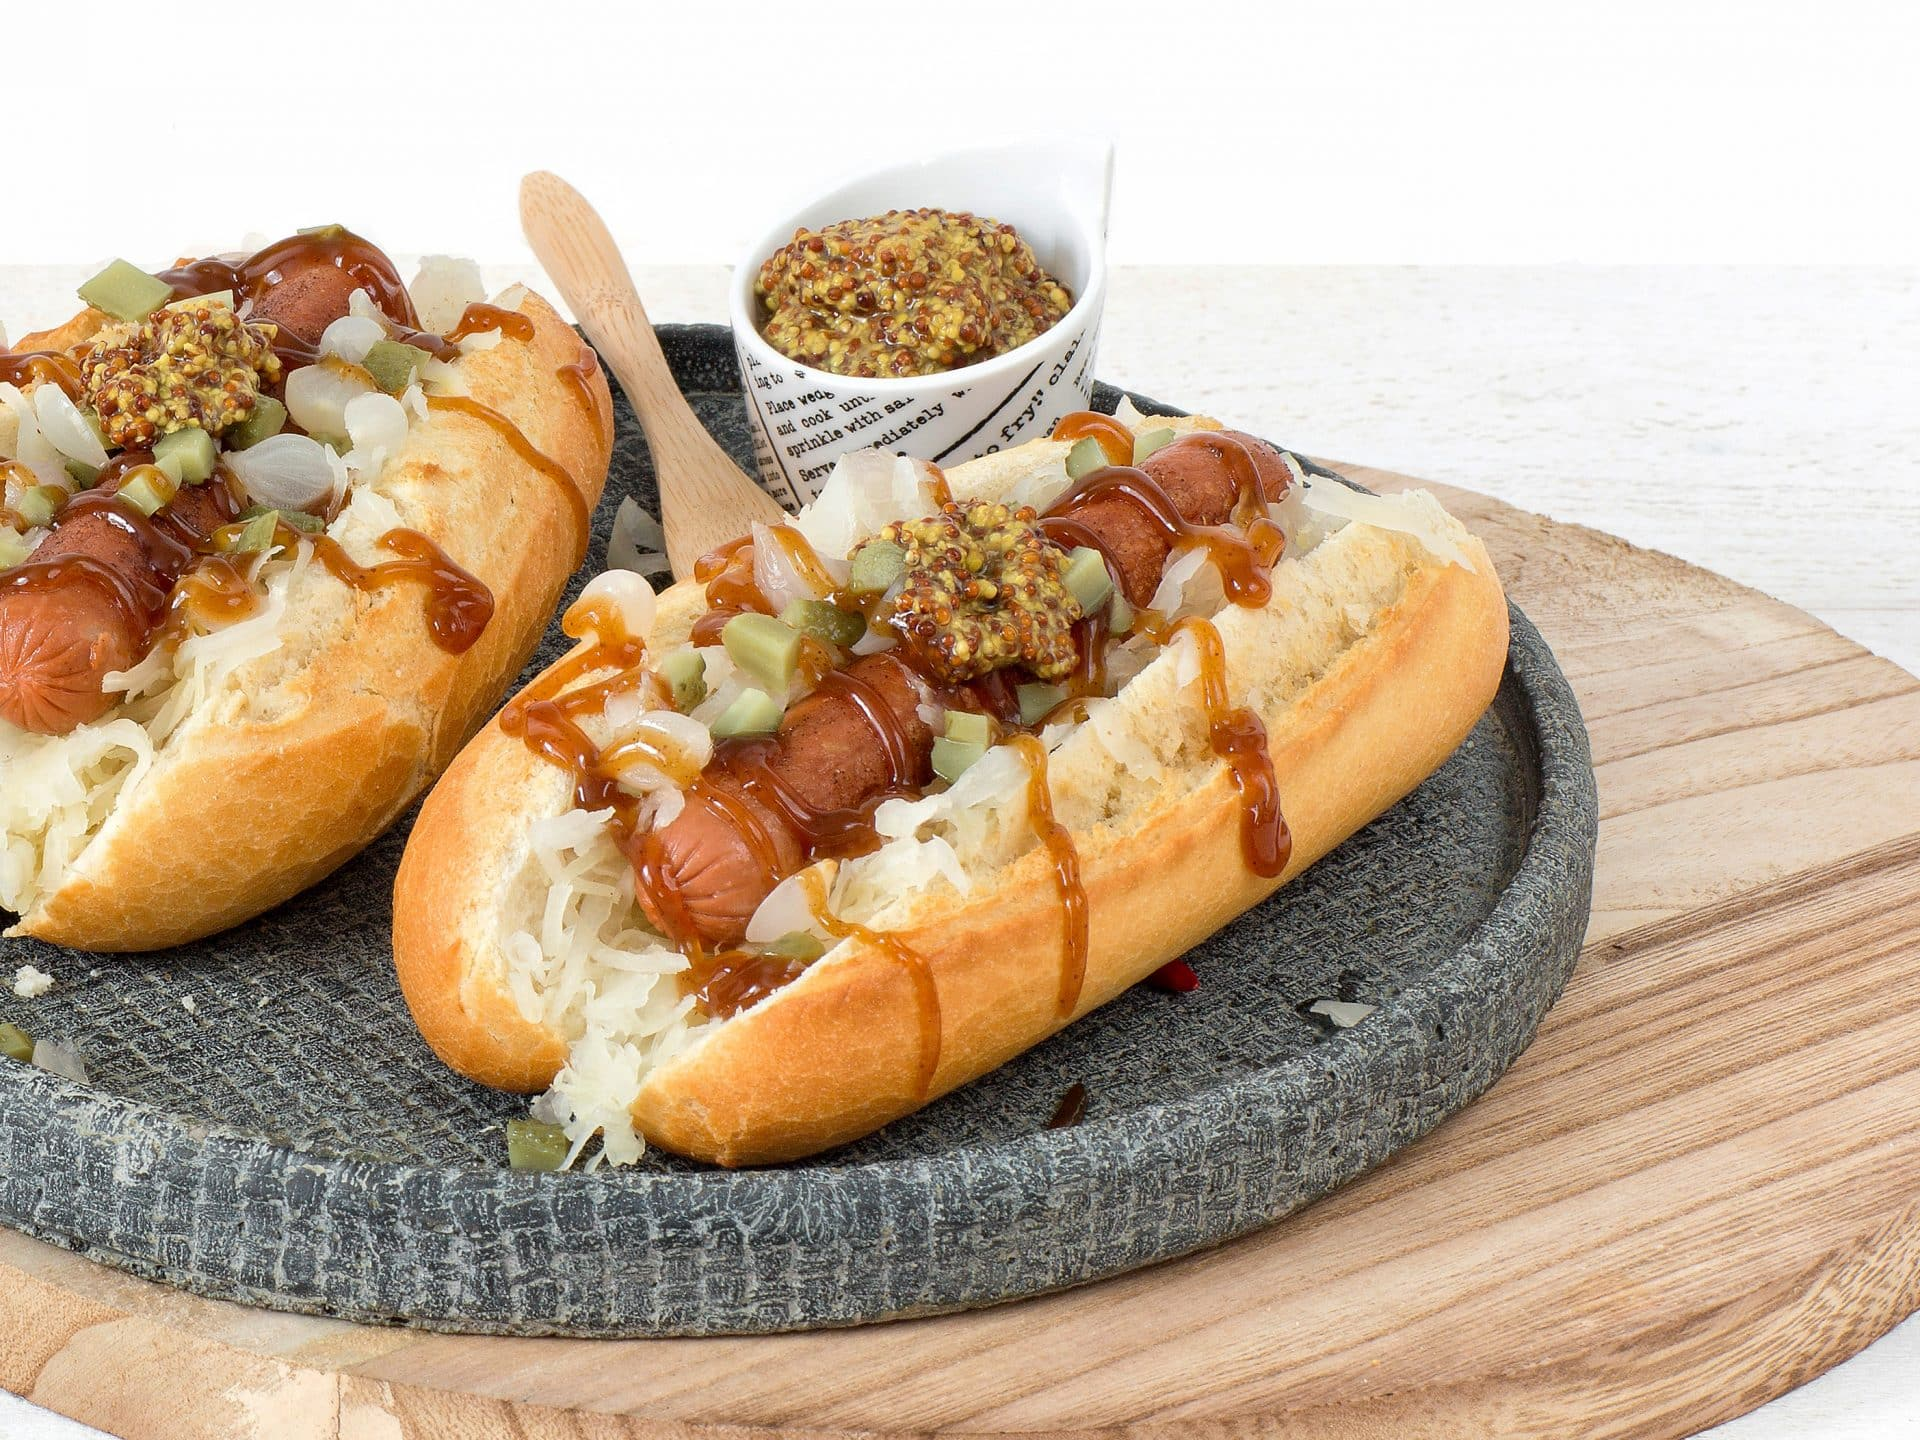 Meat substitute: Vegetarian Frankfurter sausage